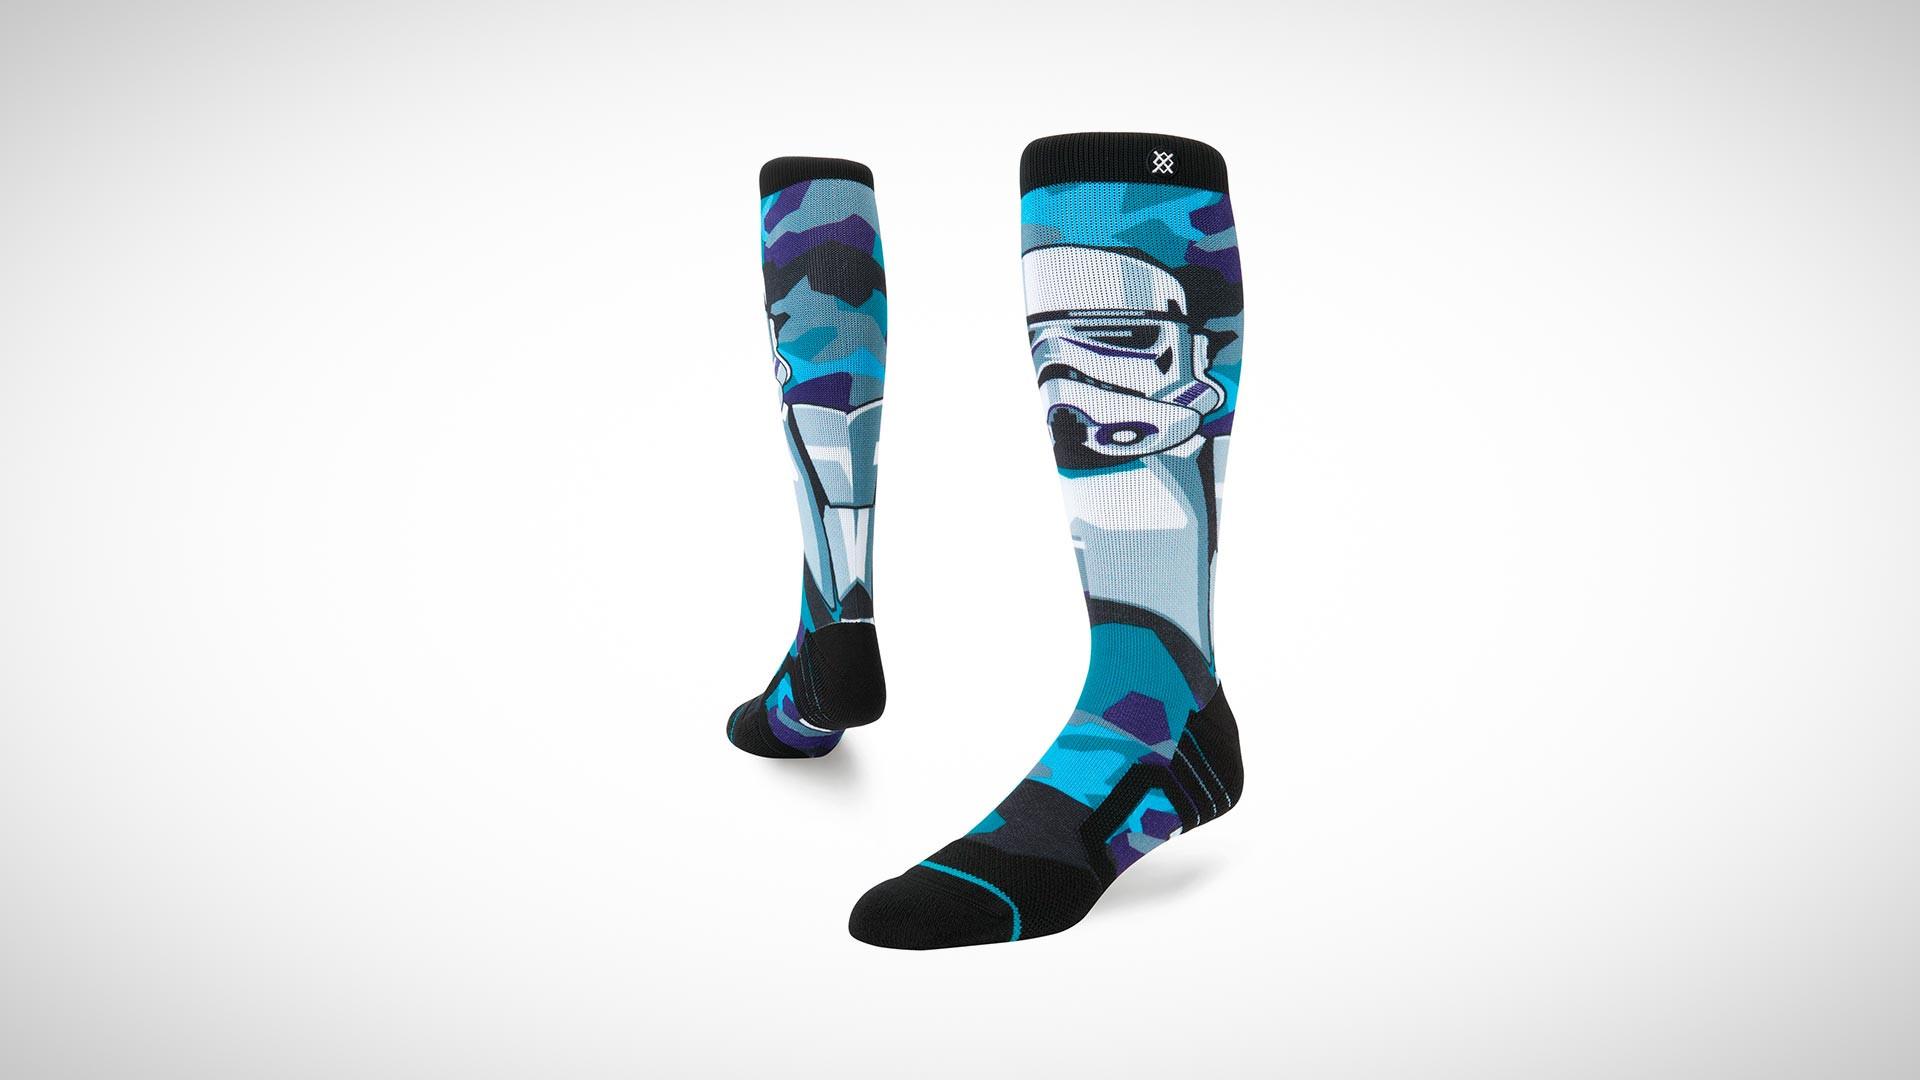 Stormtrooper socks from Stance